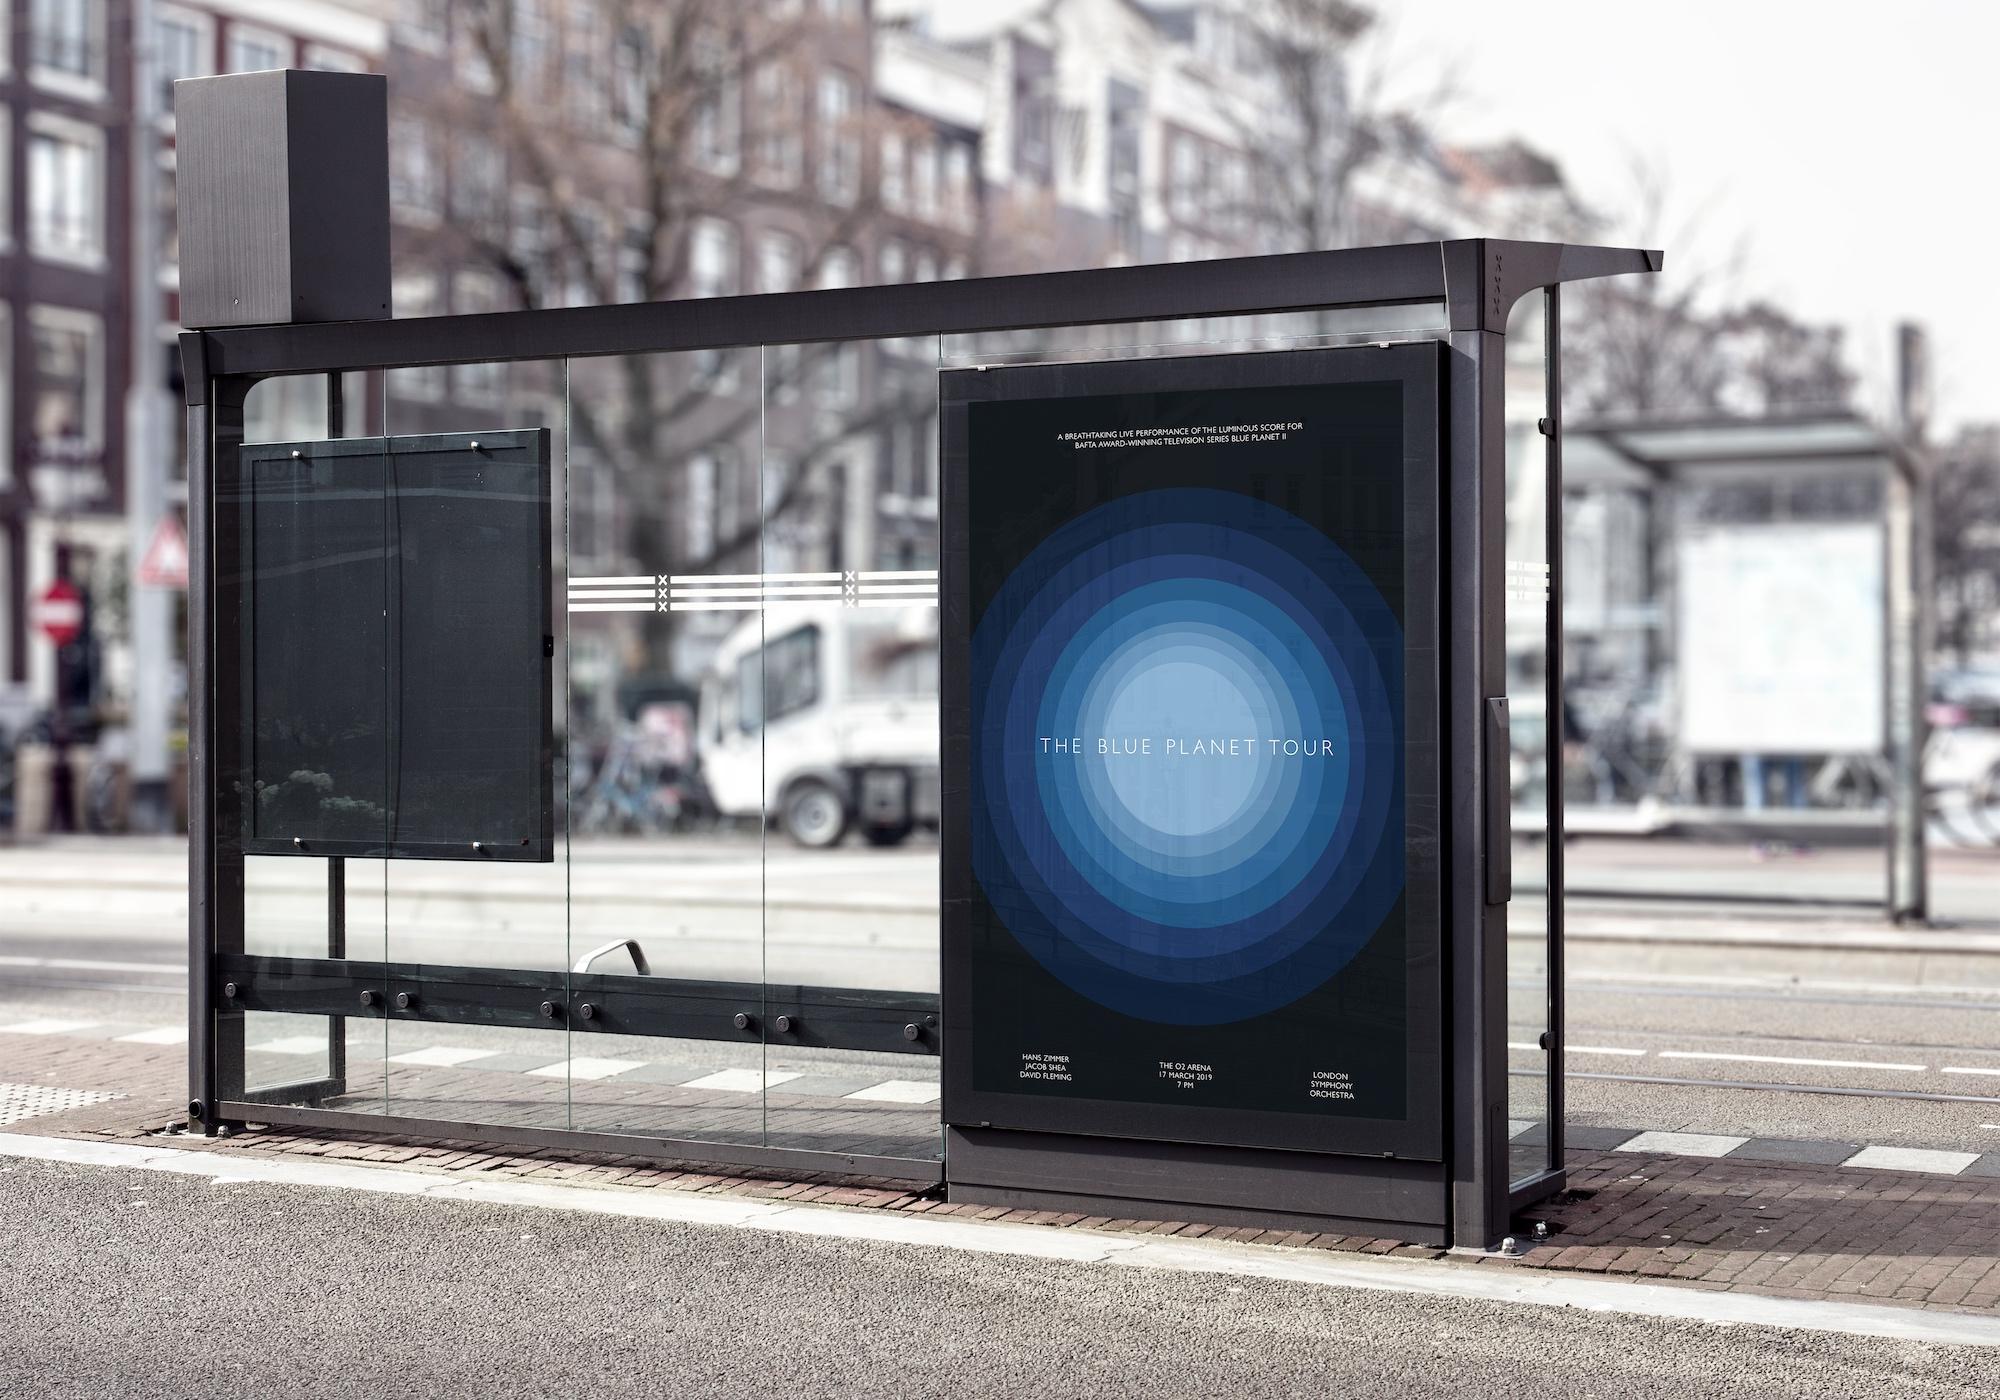 Blue Planet Poster Bus Stop Mockup.jpg